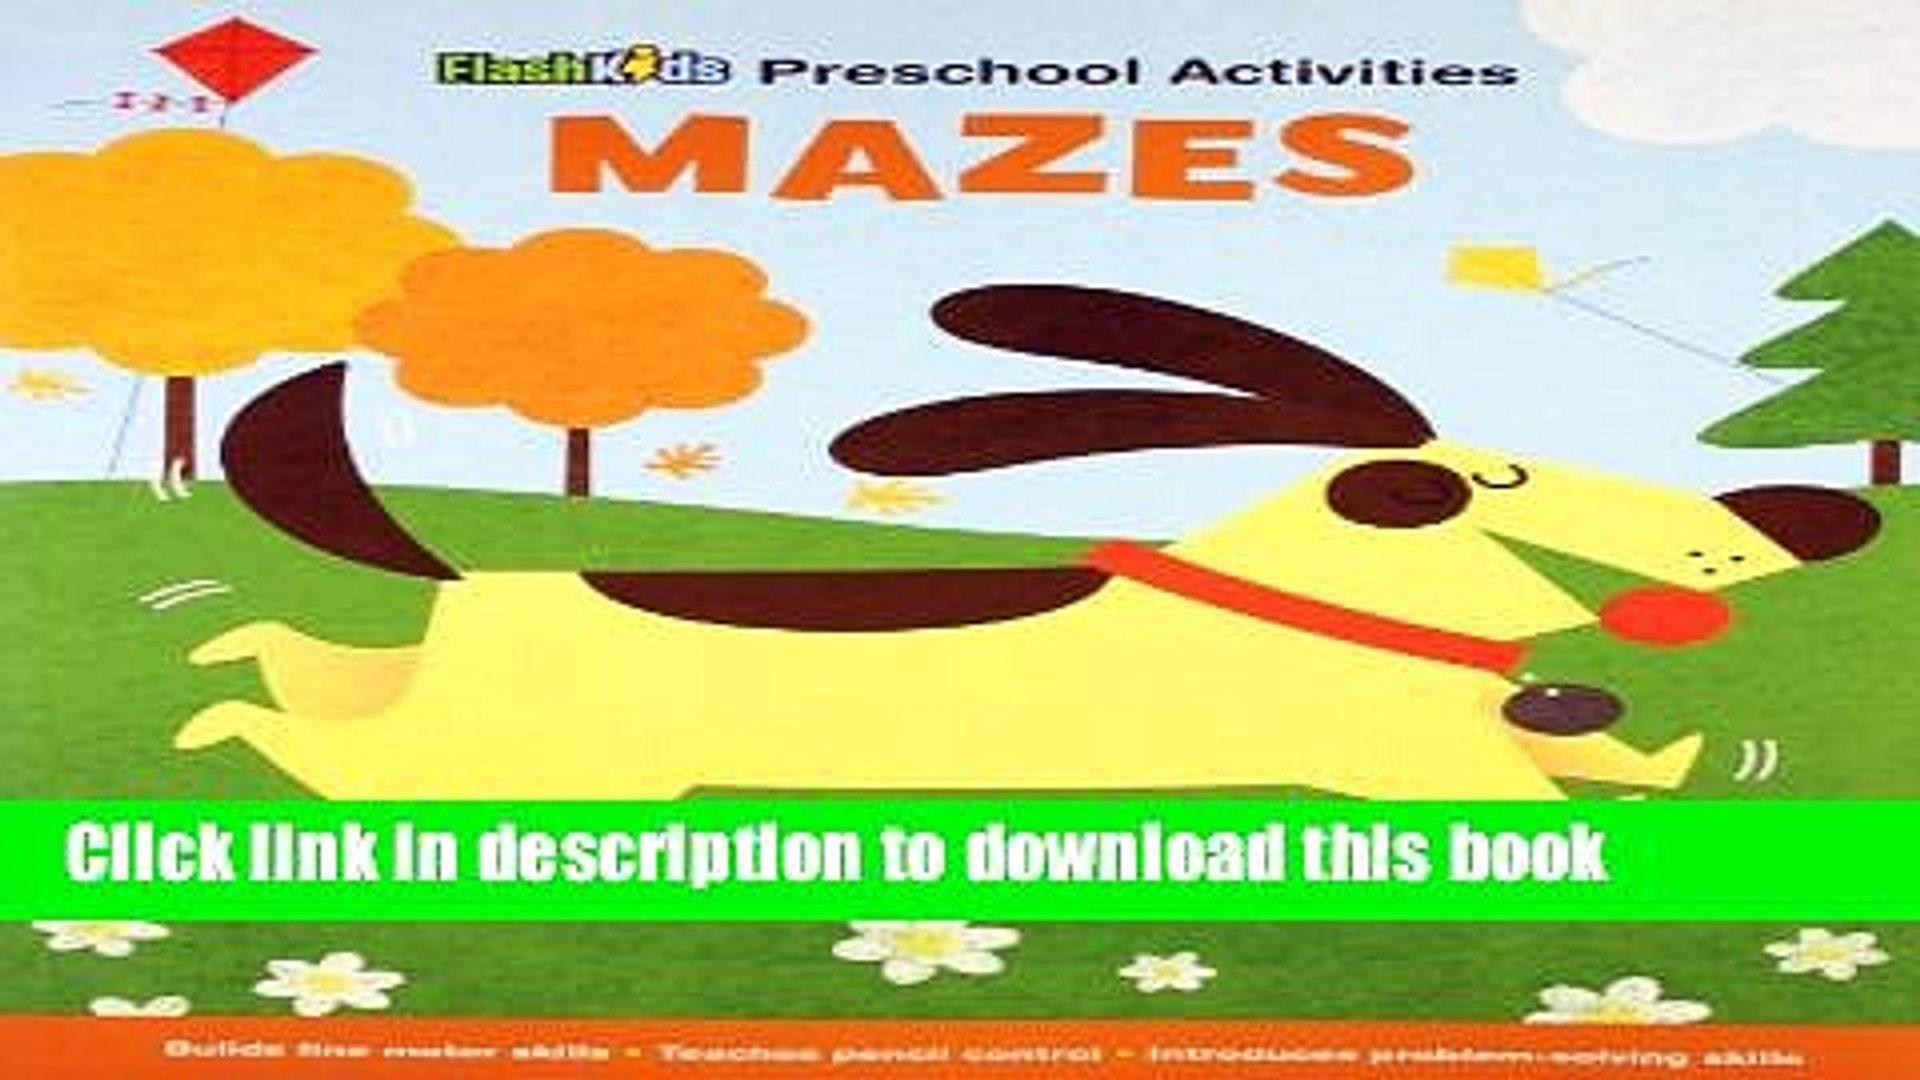 [Download] Mazes (Flash Kids Preschool Activity Books) Paperback Collection